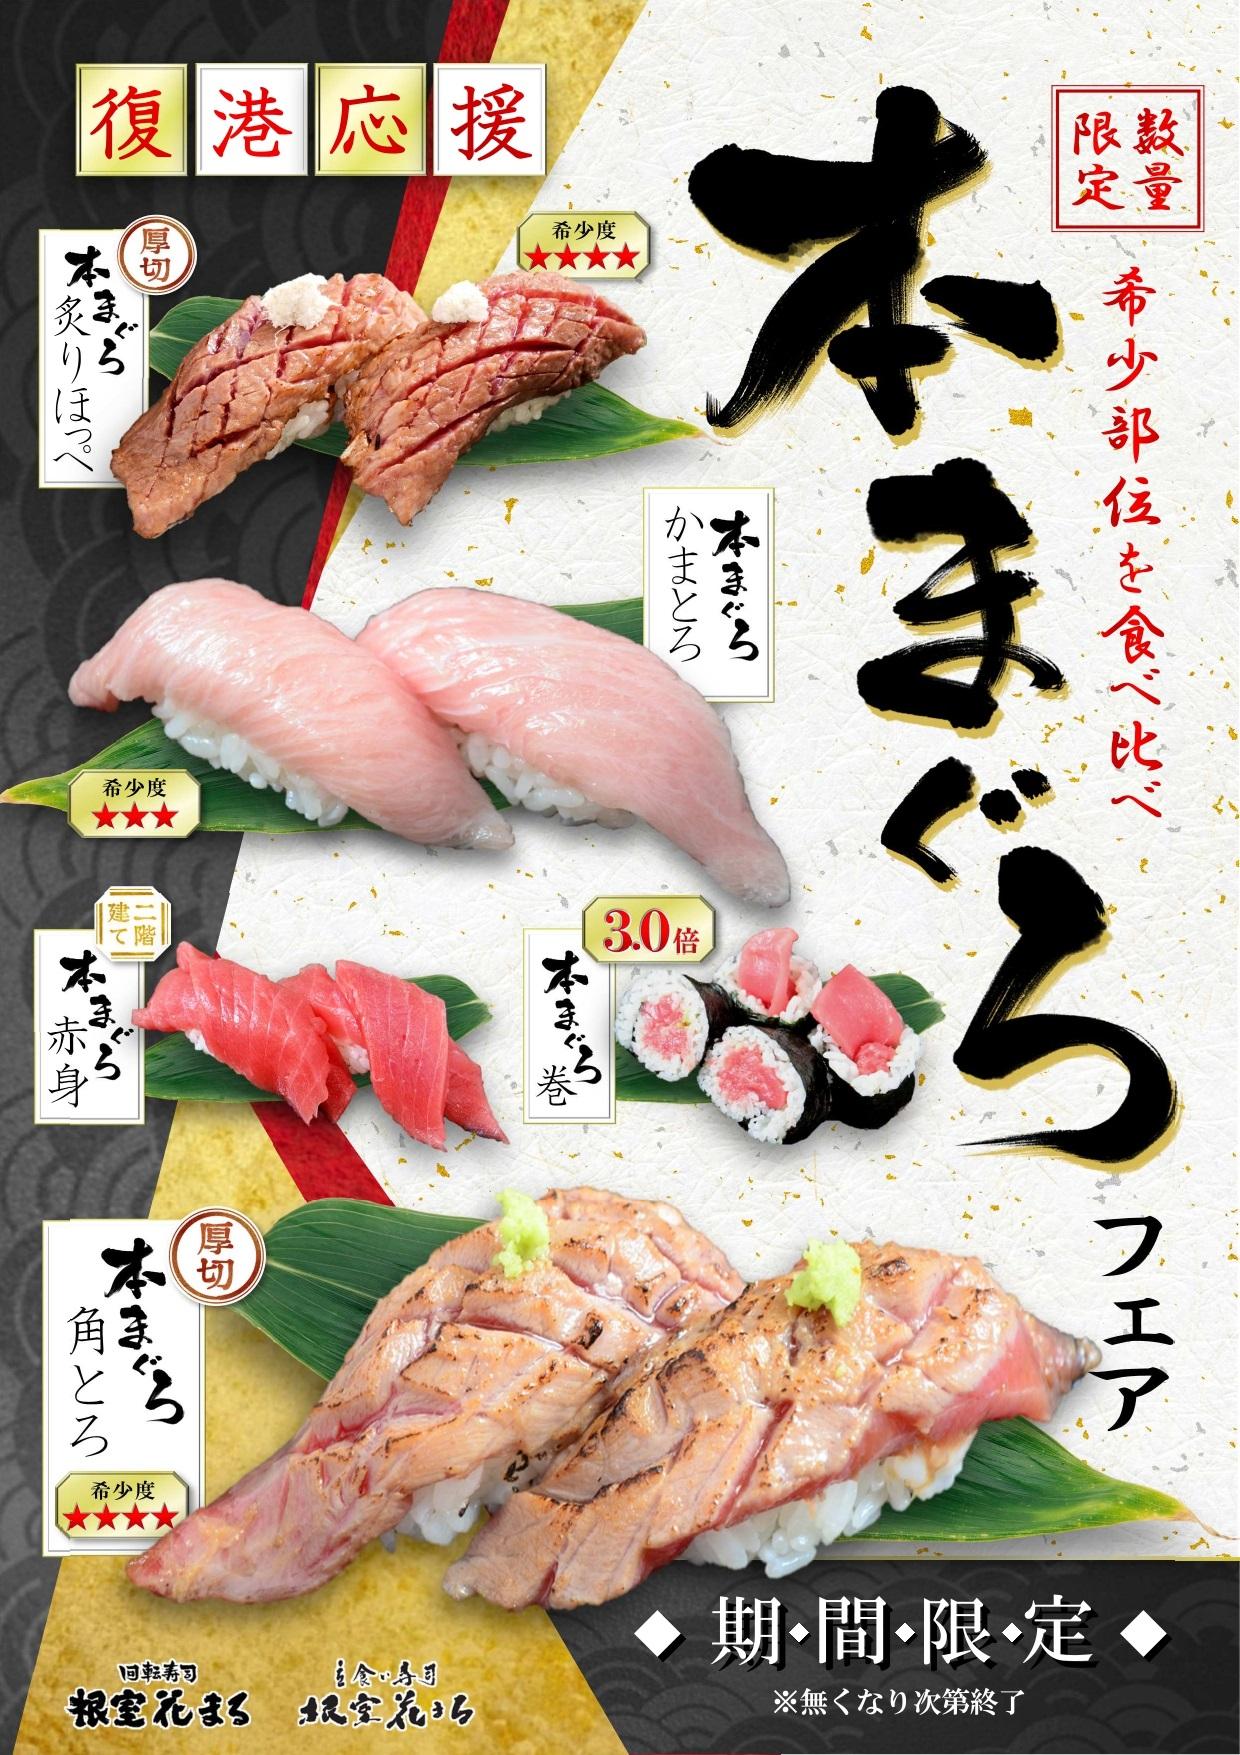 chirashi_honmaguro.jpg